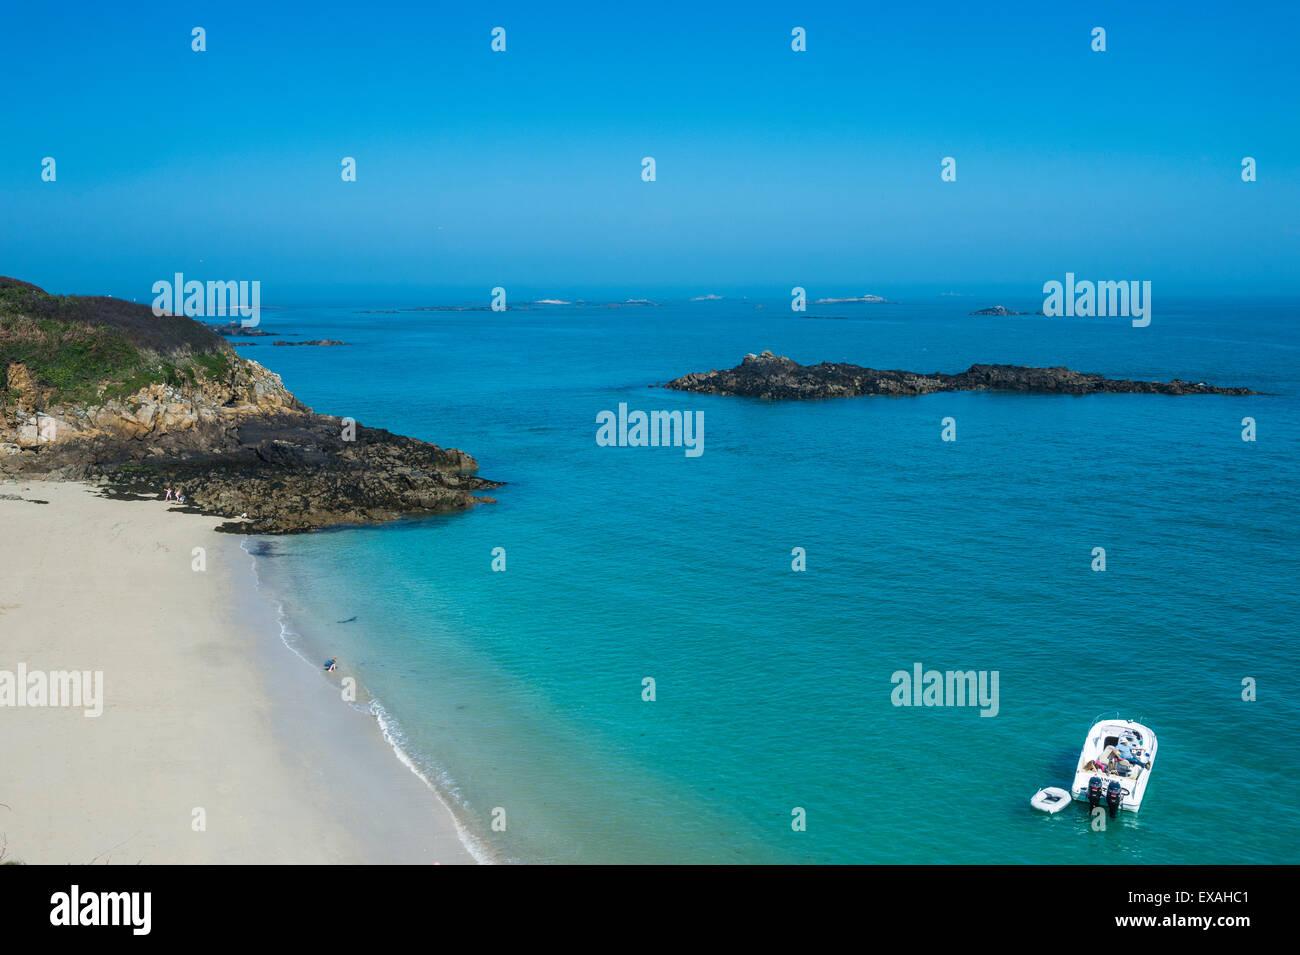 Belvoir Bay, Herm, Channel Islands, Royaume-Uni, Europe Photo Stock